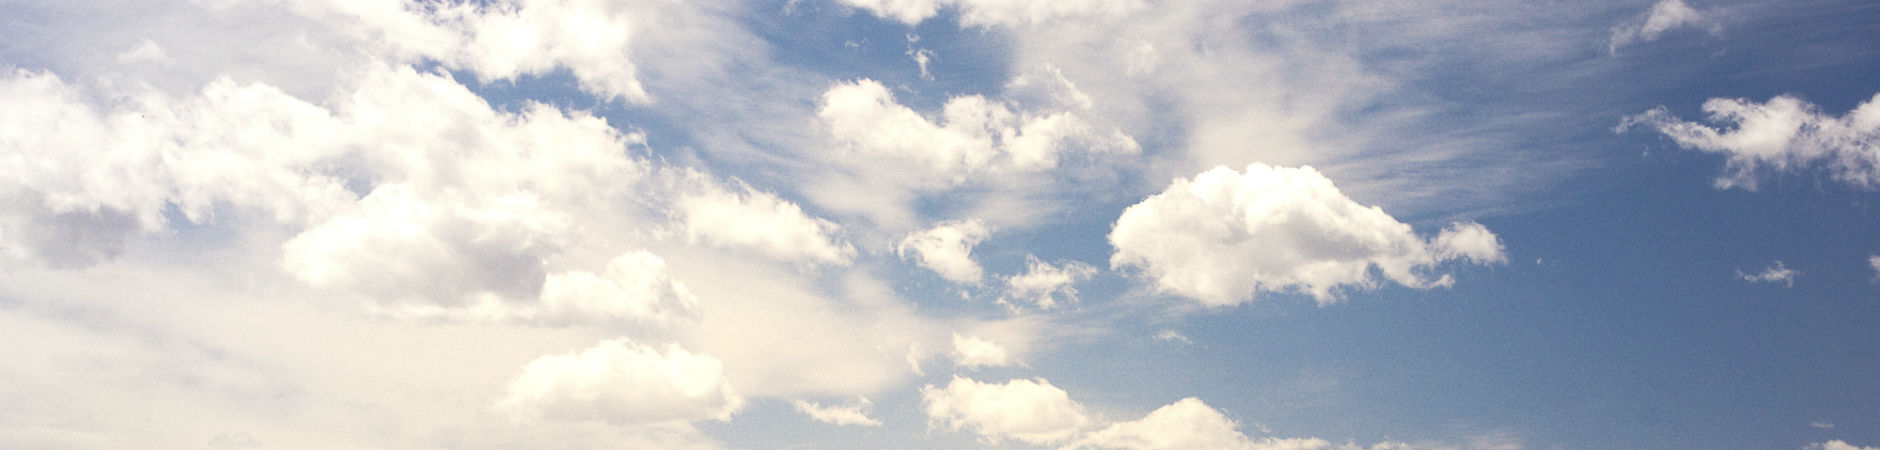 Common Cloud Misconceptions